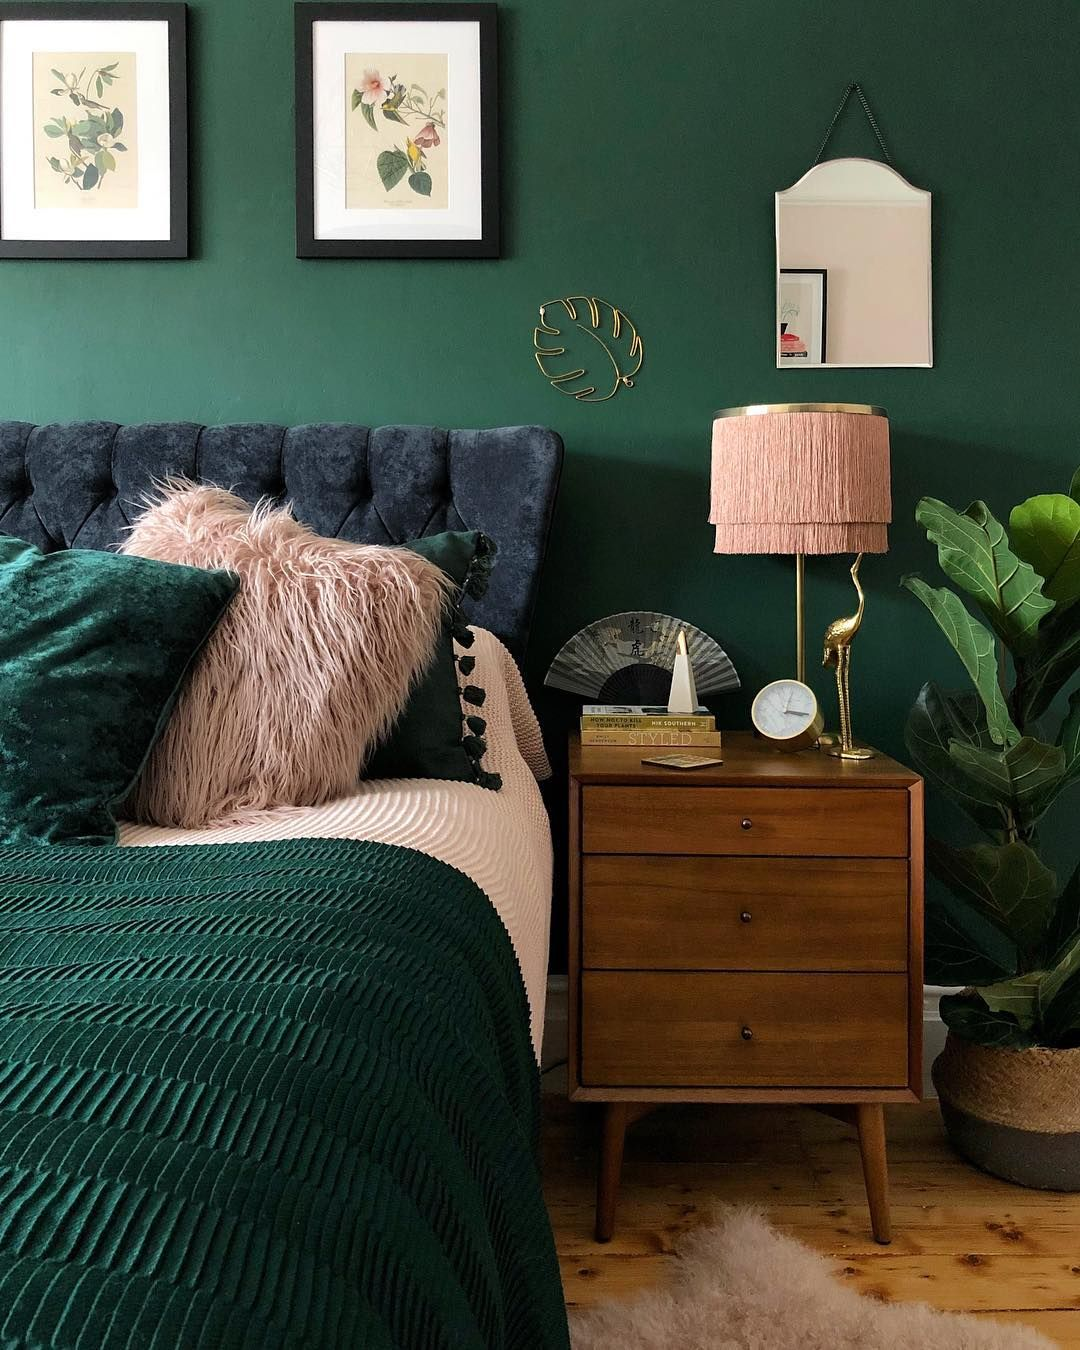 Dark Green Bedroom Ideas Cosybedroom Moodycolours Greenbedroom Emeraldbedroom Bedroomideas Best Bedroom Colors Home Decor Bedroom Green Bedroom Colors